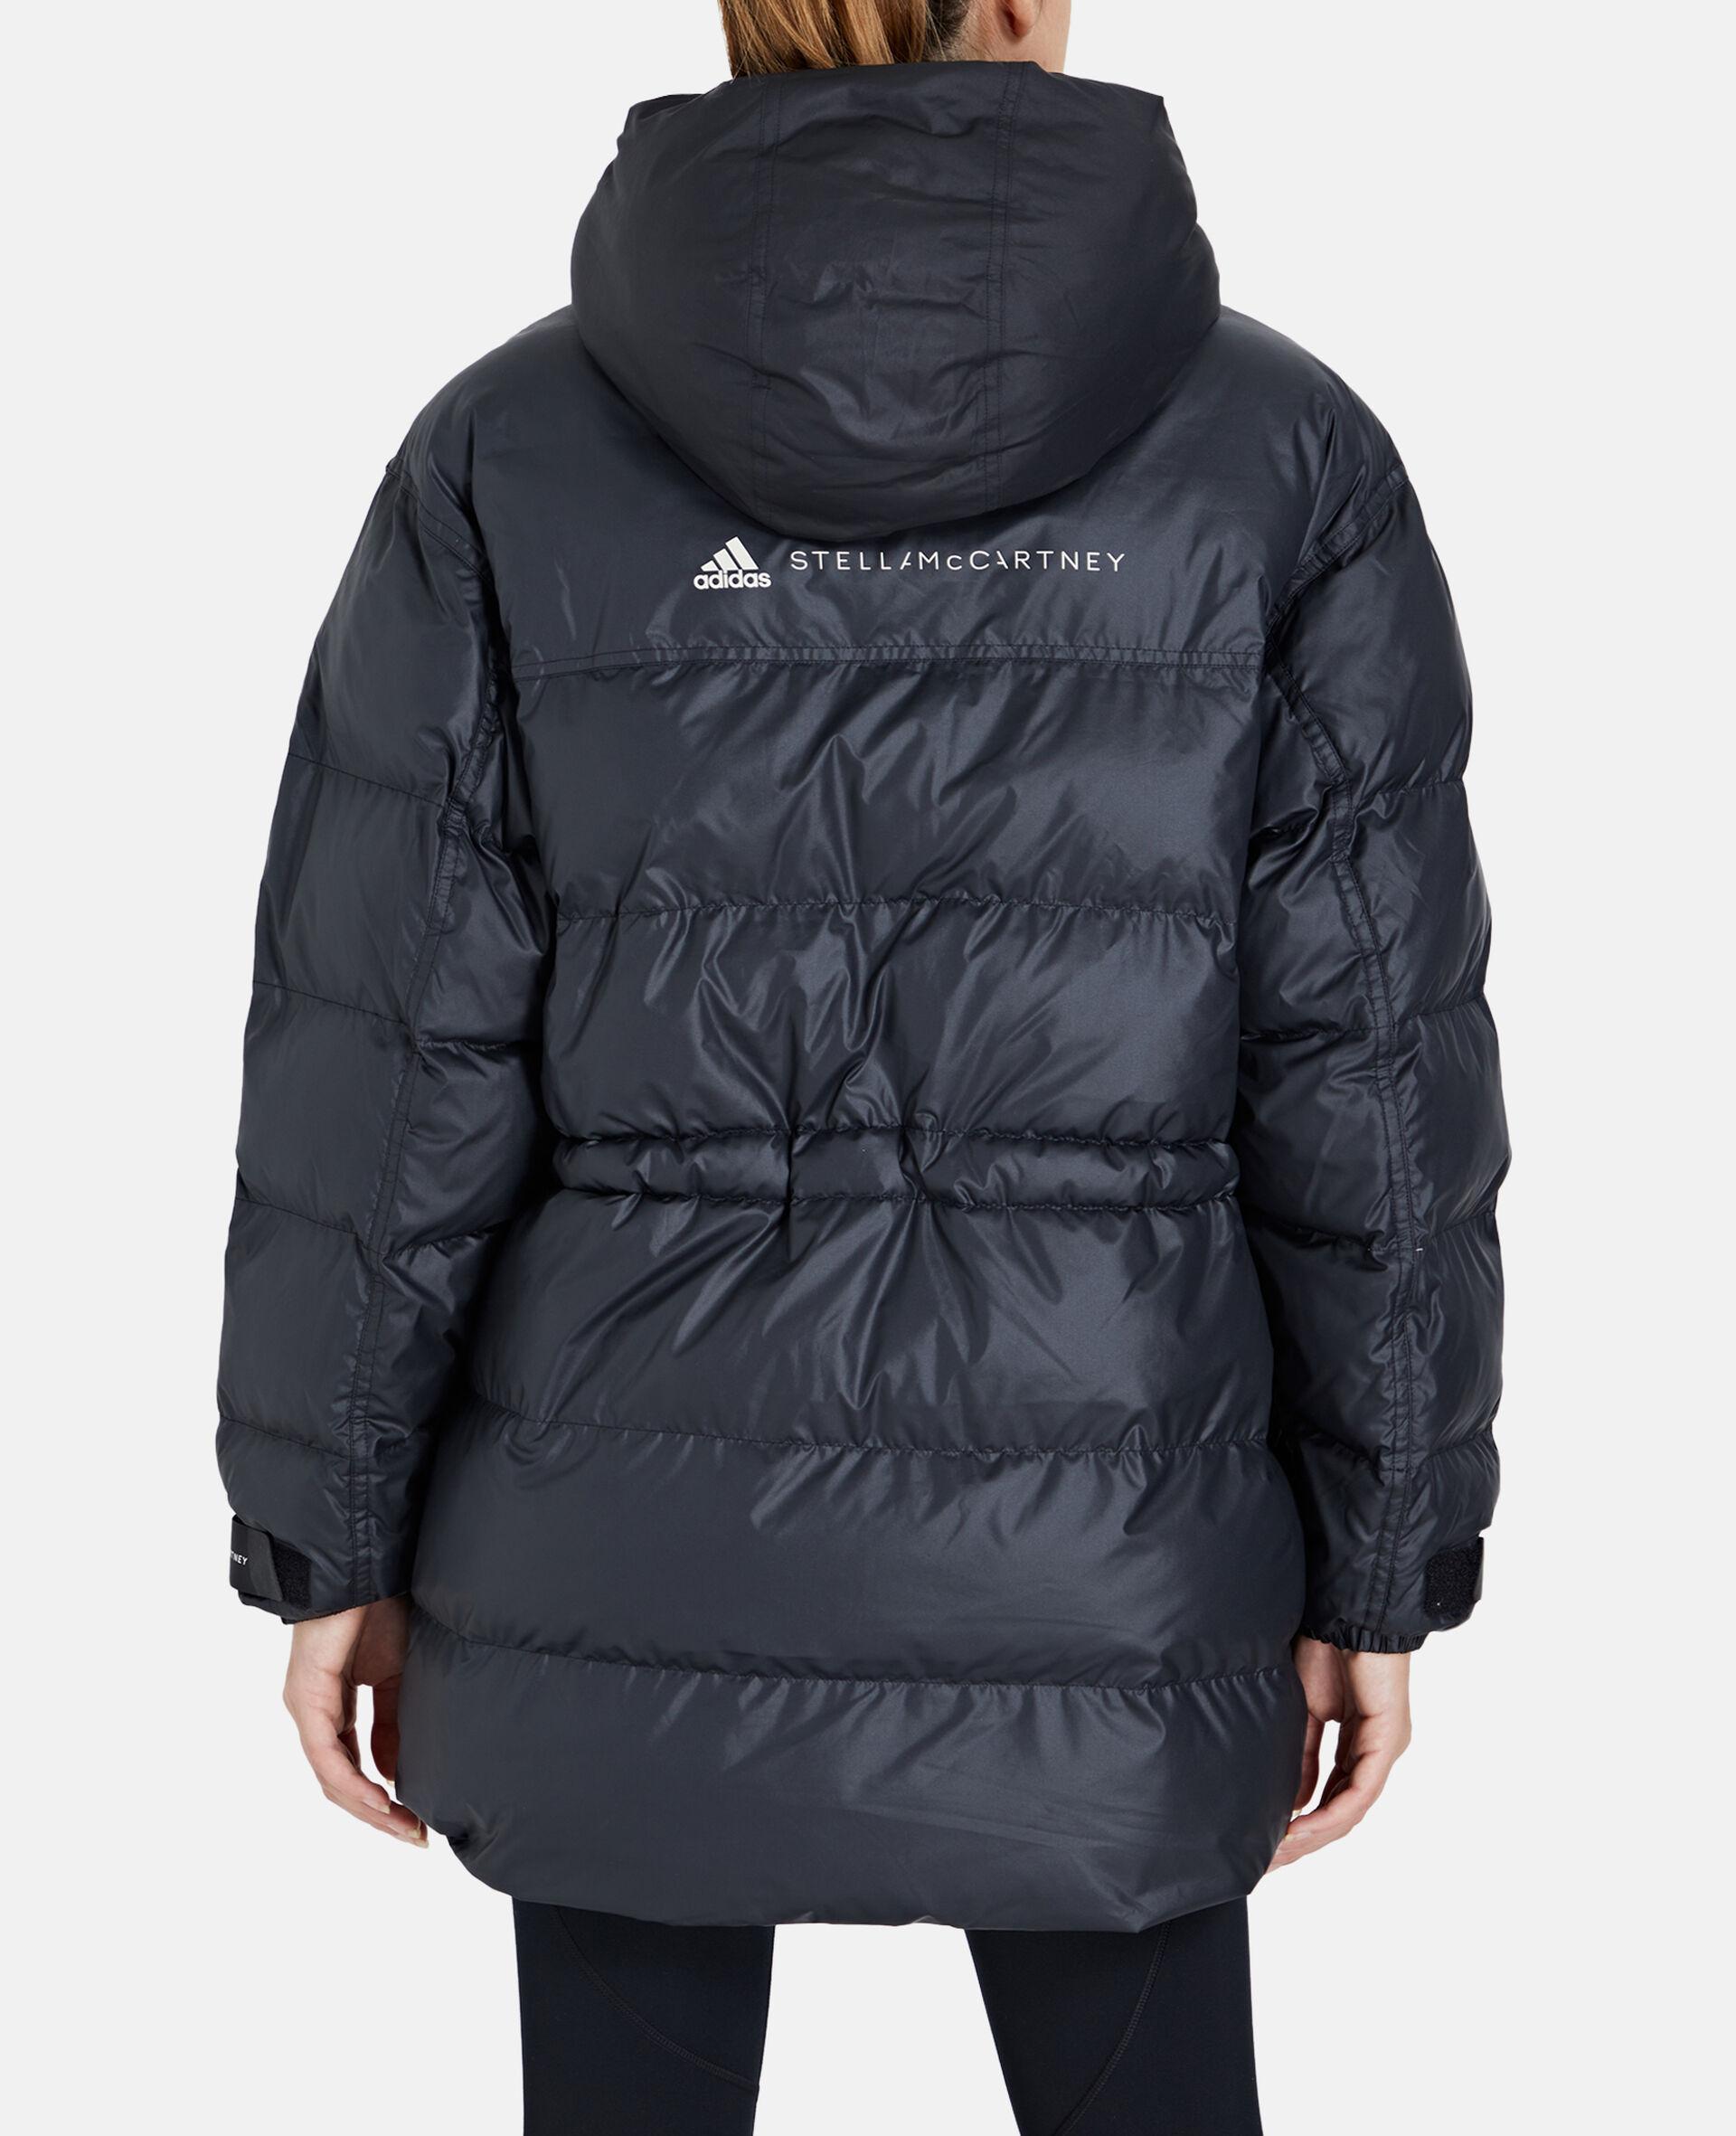 2 合 1 中长款衬垫夹克-黑色-large image number 2